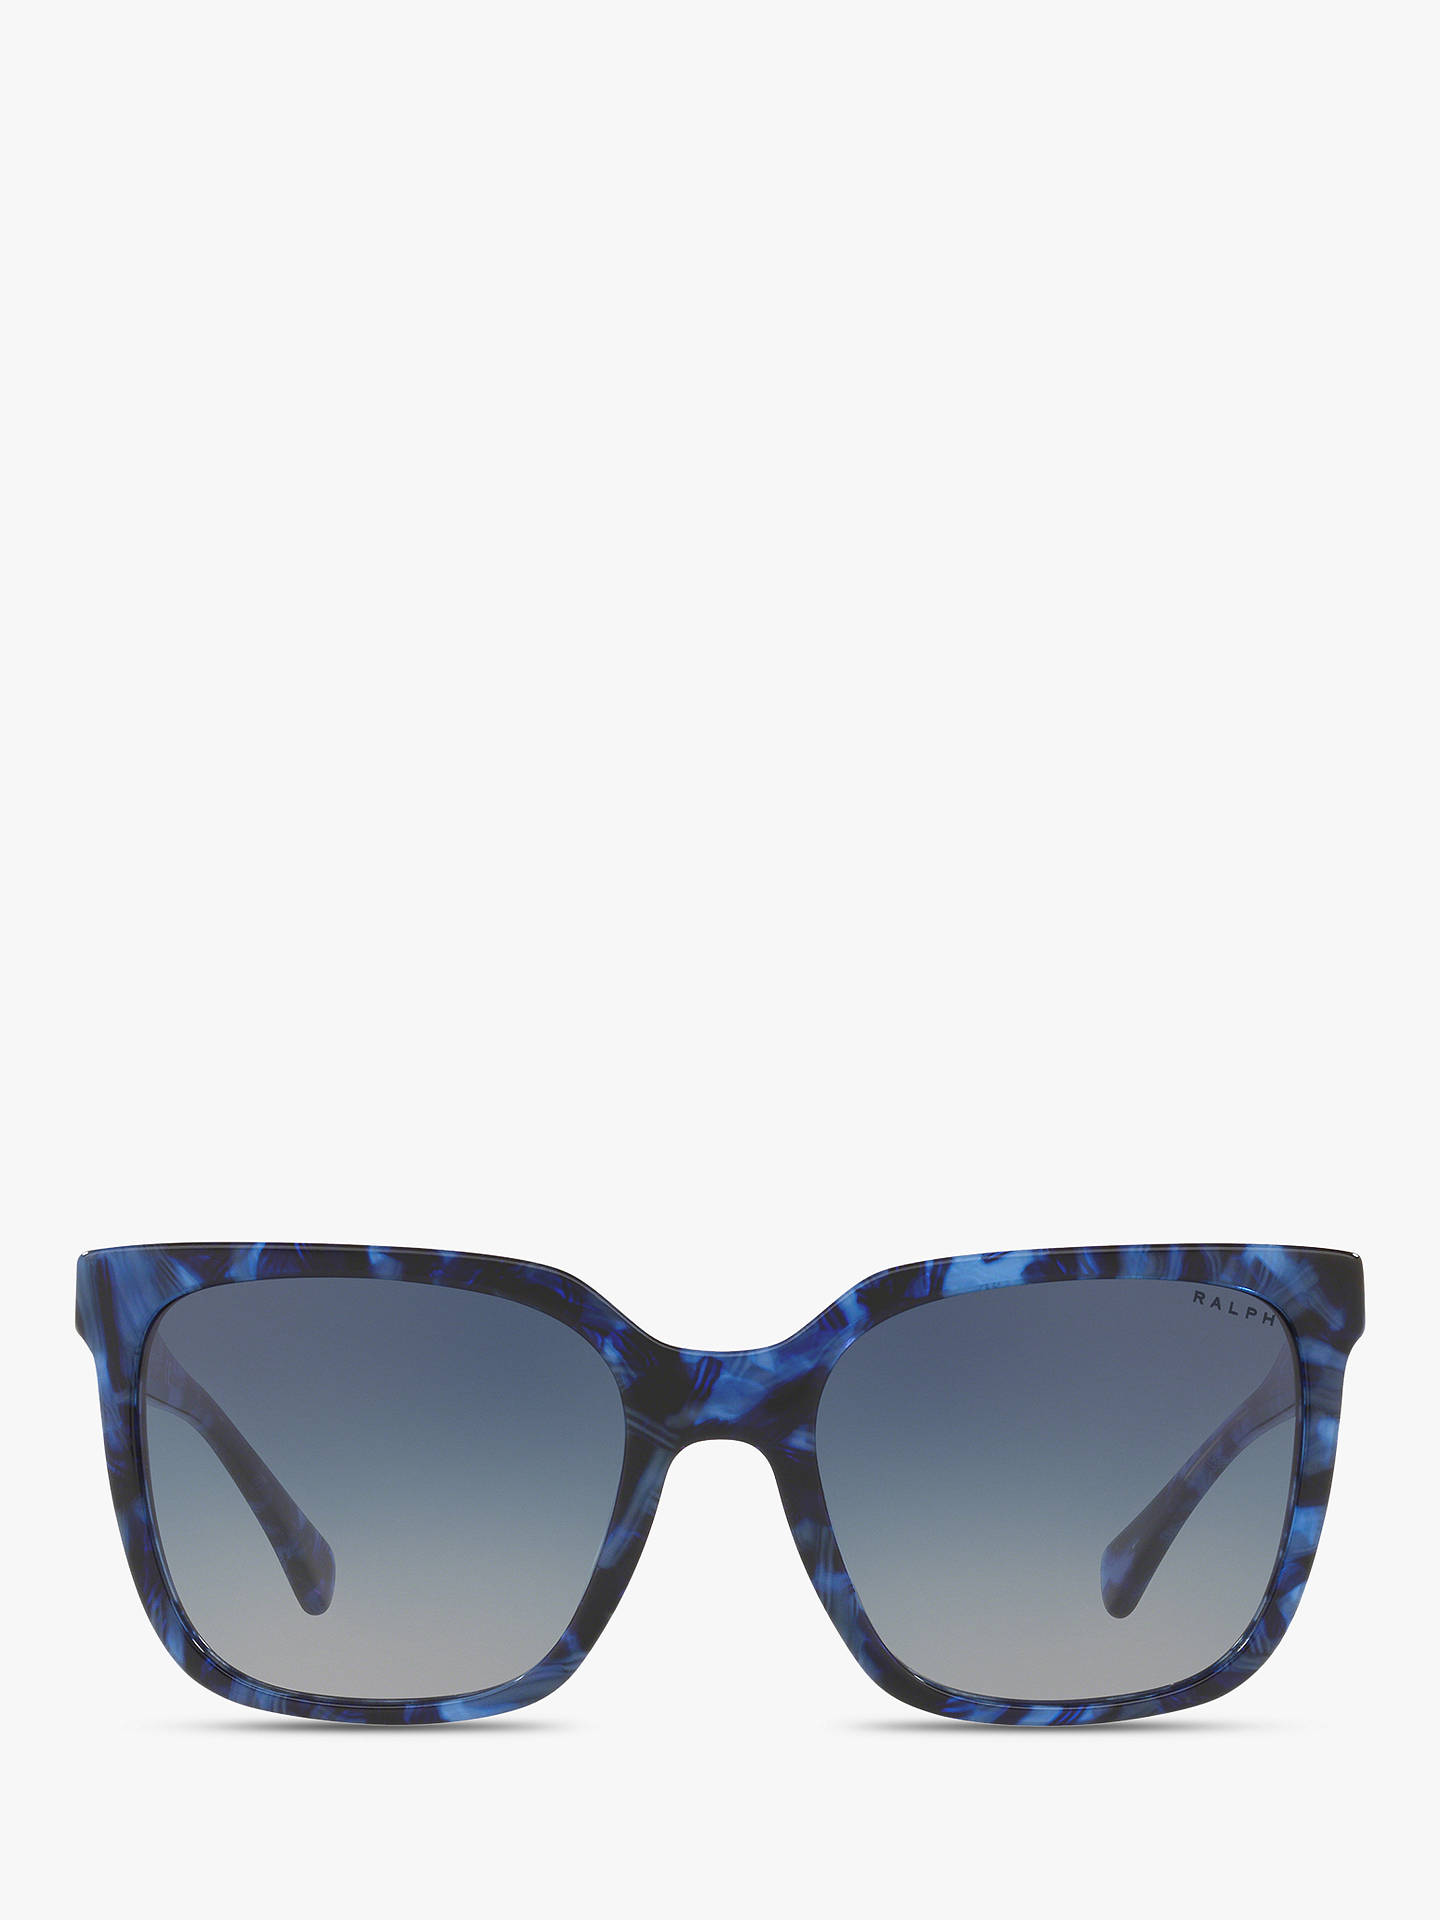 b299c2b02619 ... Buy Polo Ralph Lauren RA5251 Women's Square Sunglasses, Blue  Marble/Grey Gradient Online at ...